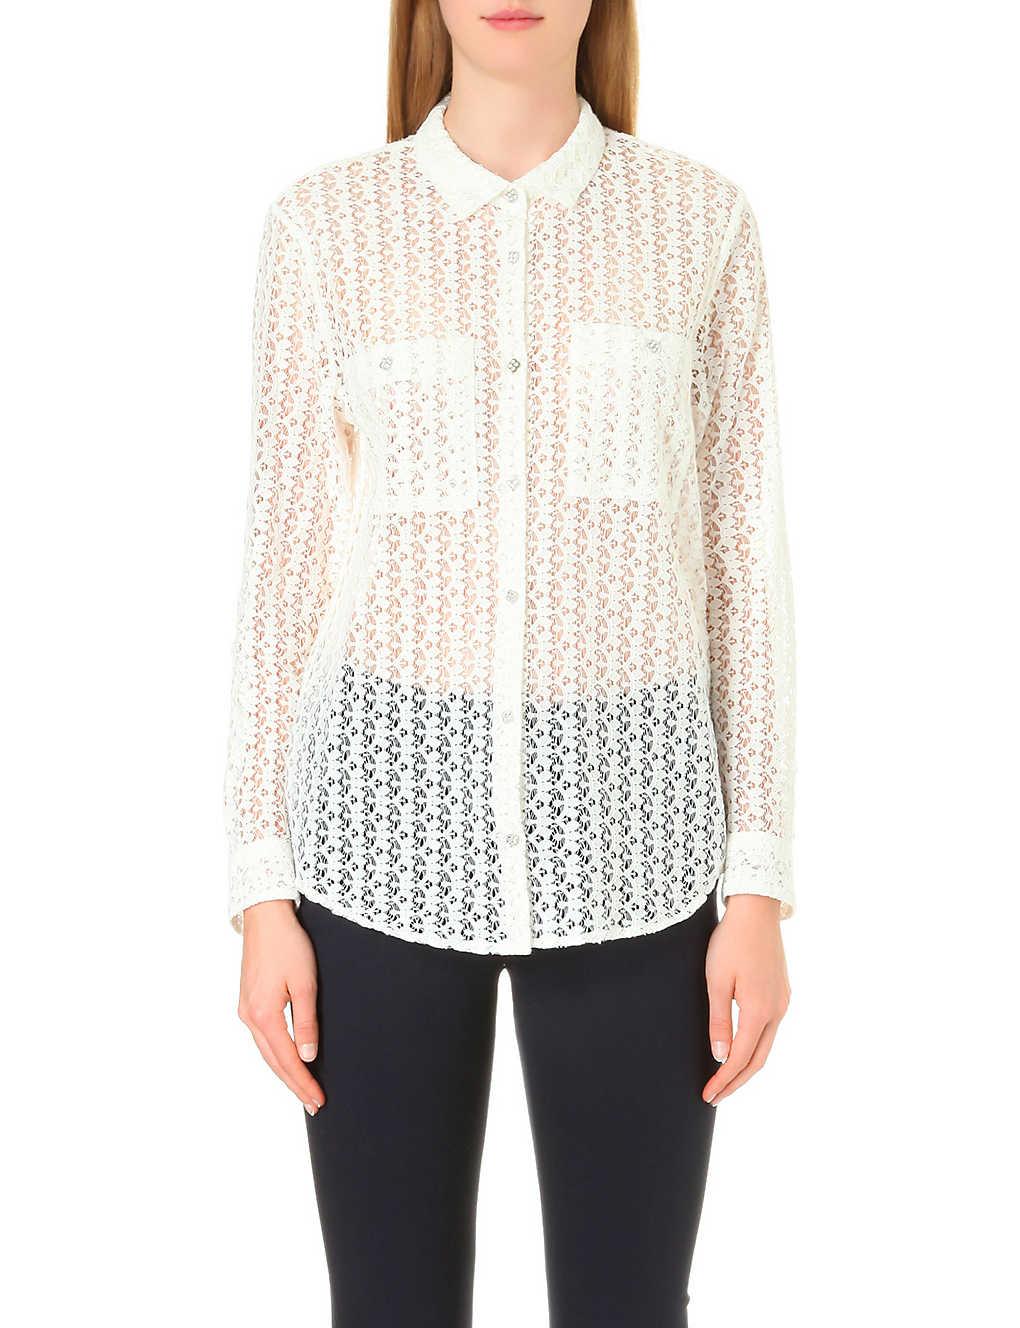 0bee0f2f9d THE KOOPLES - Semi-sheer lace shirt   Selfridges.com